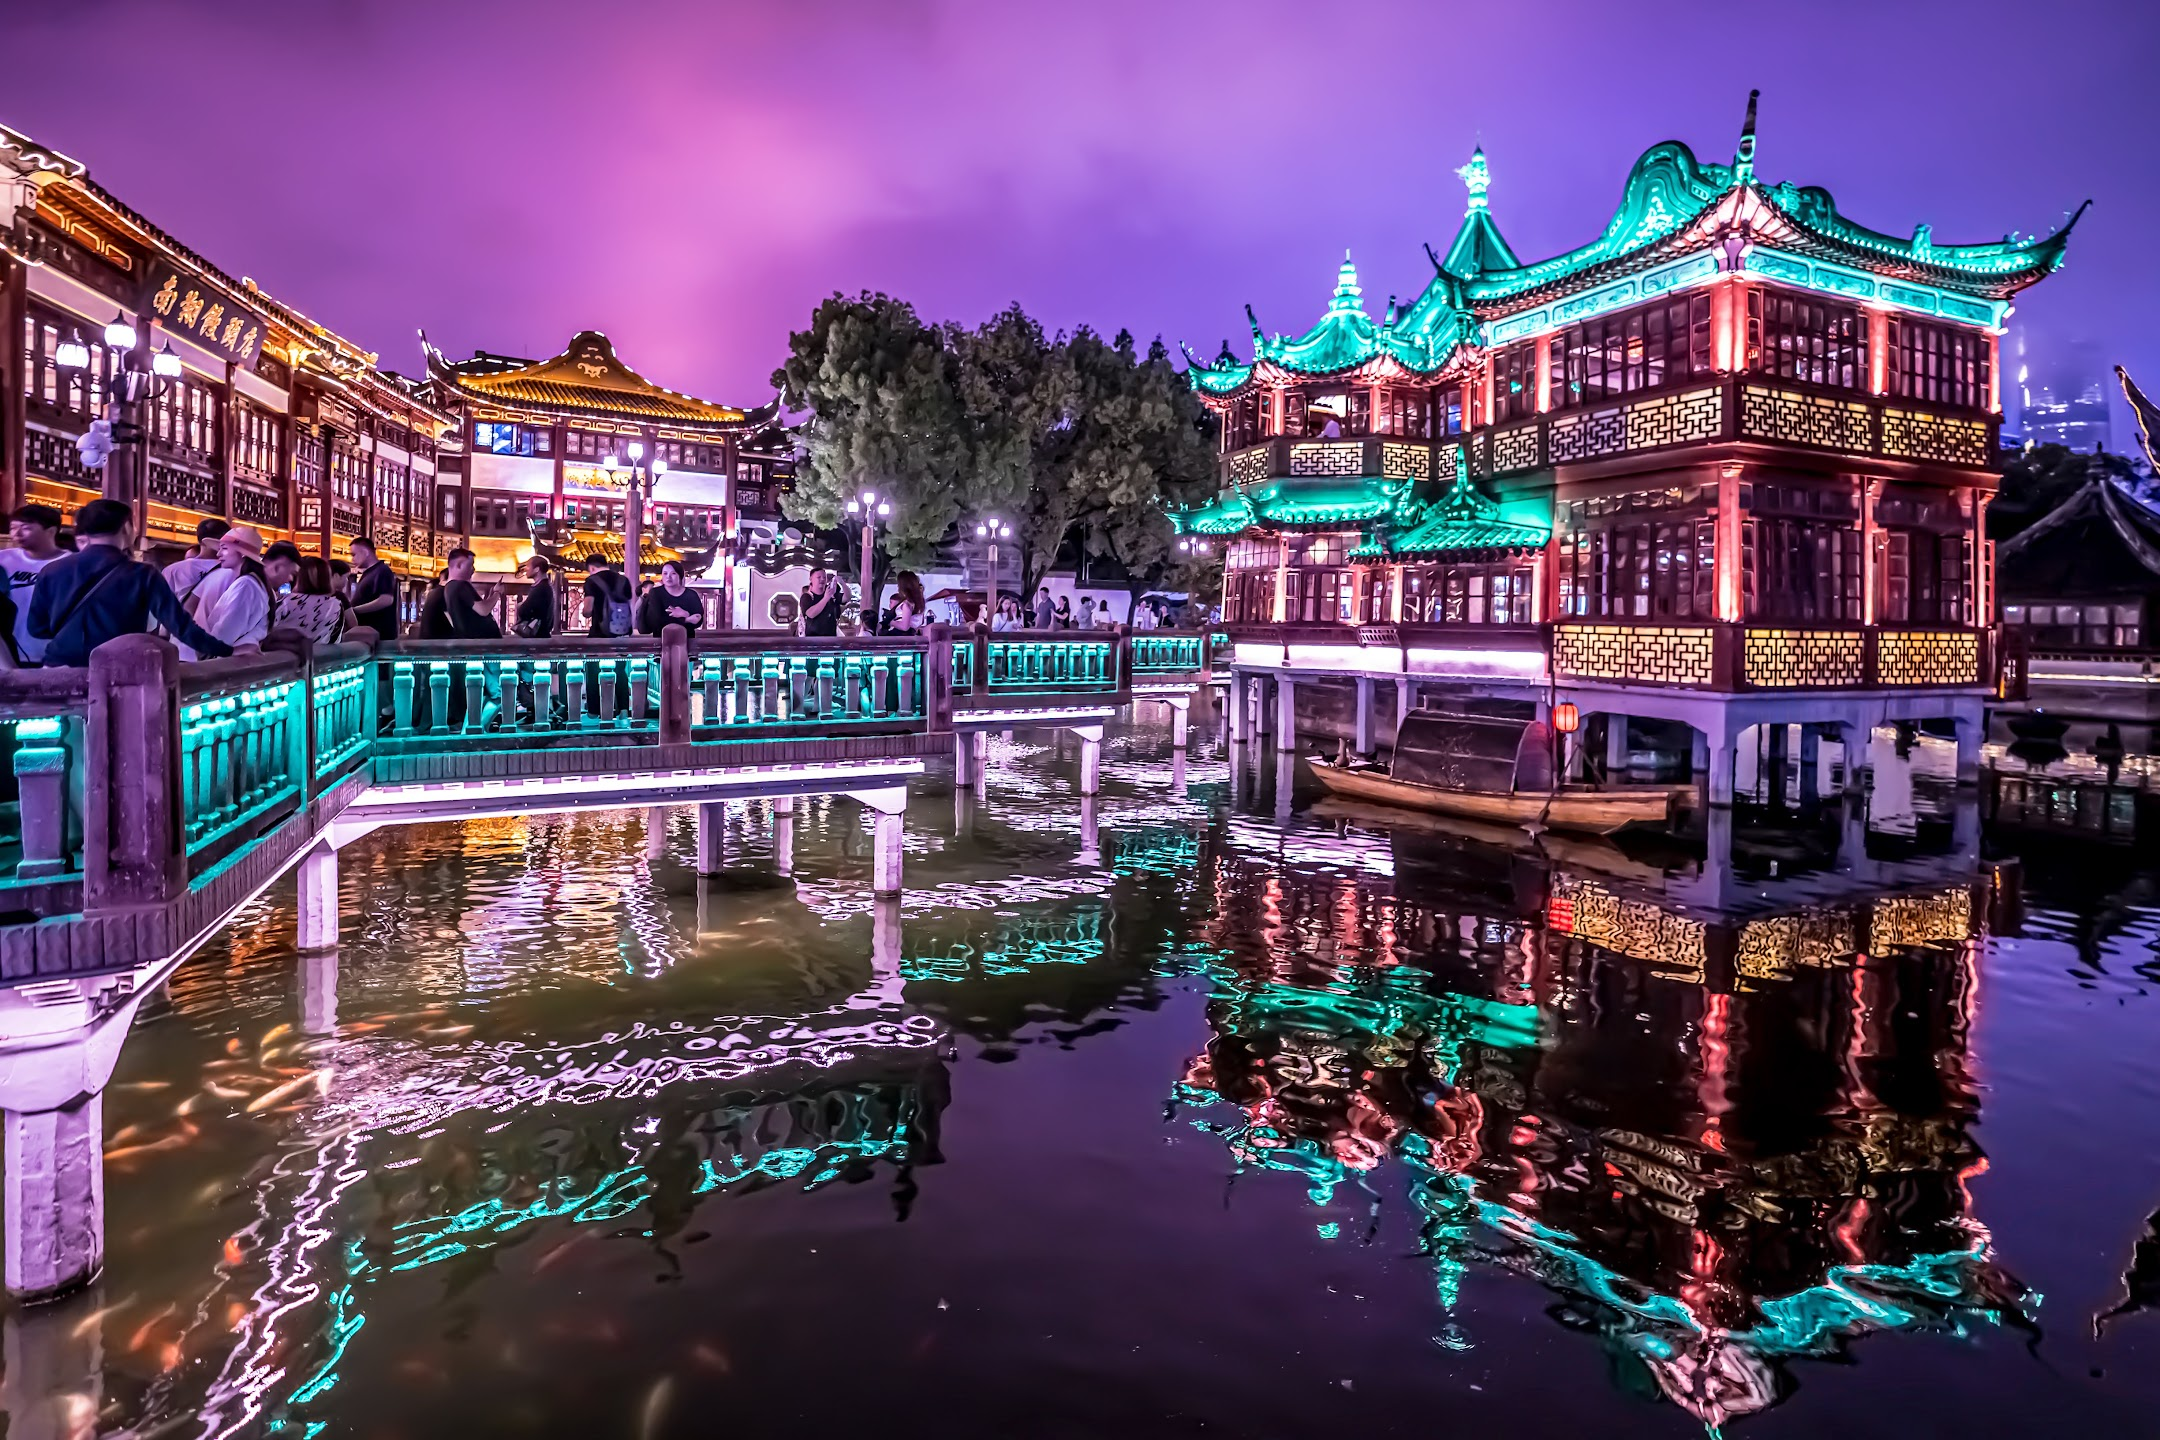 Shanghai Yuyuan Huxin Pavilion (The Mid-Lake Pavilion Teahouse) Light-up3